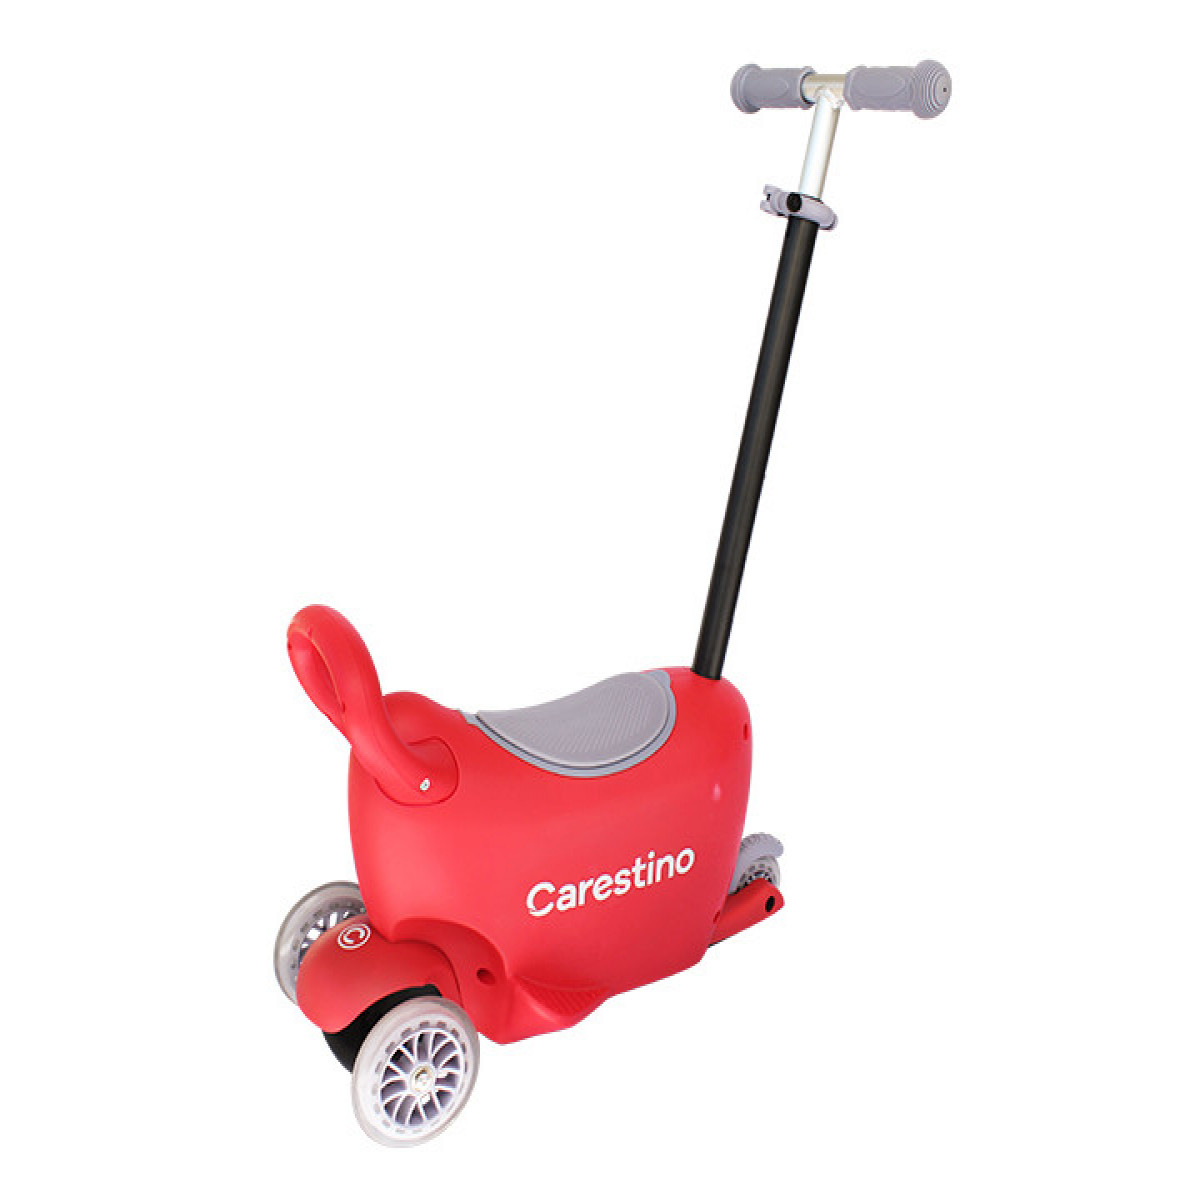 Scooter 3 en 1 Carestino rojo